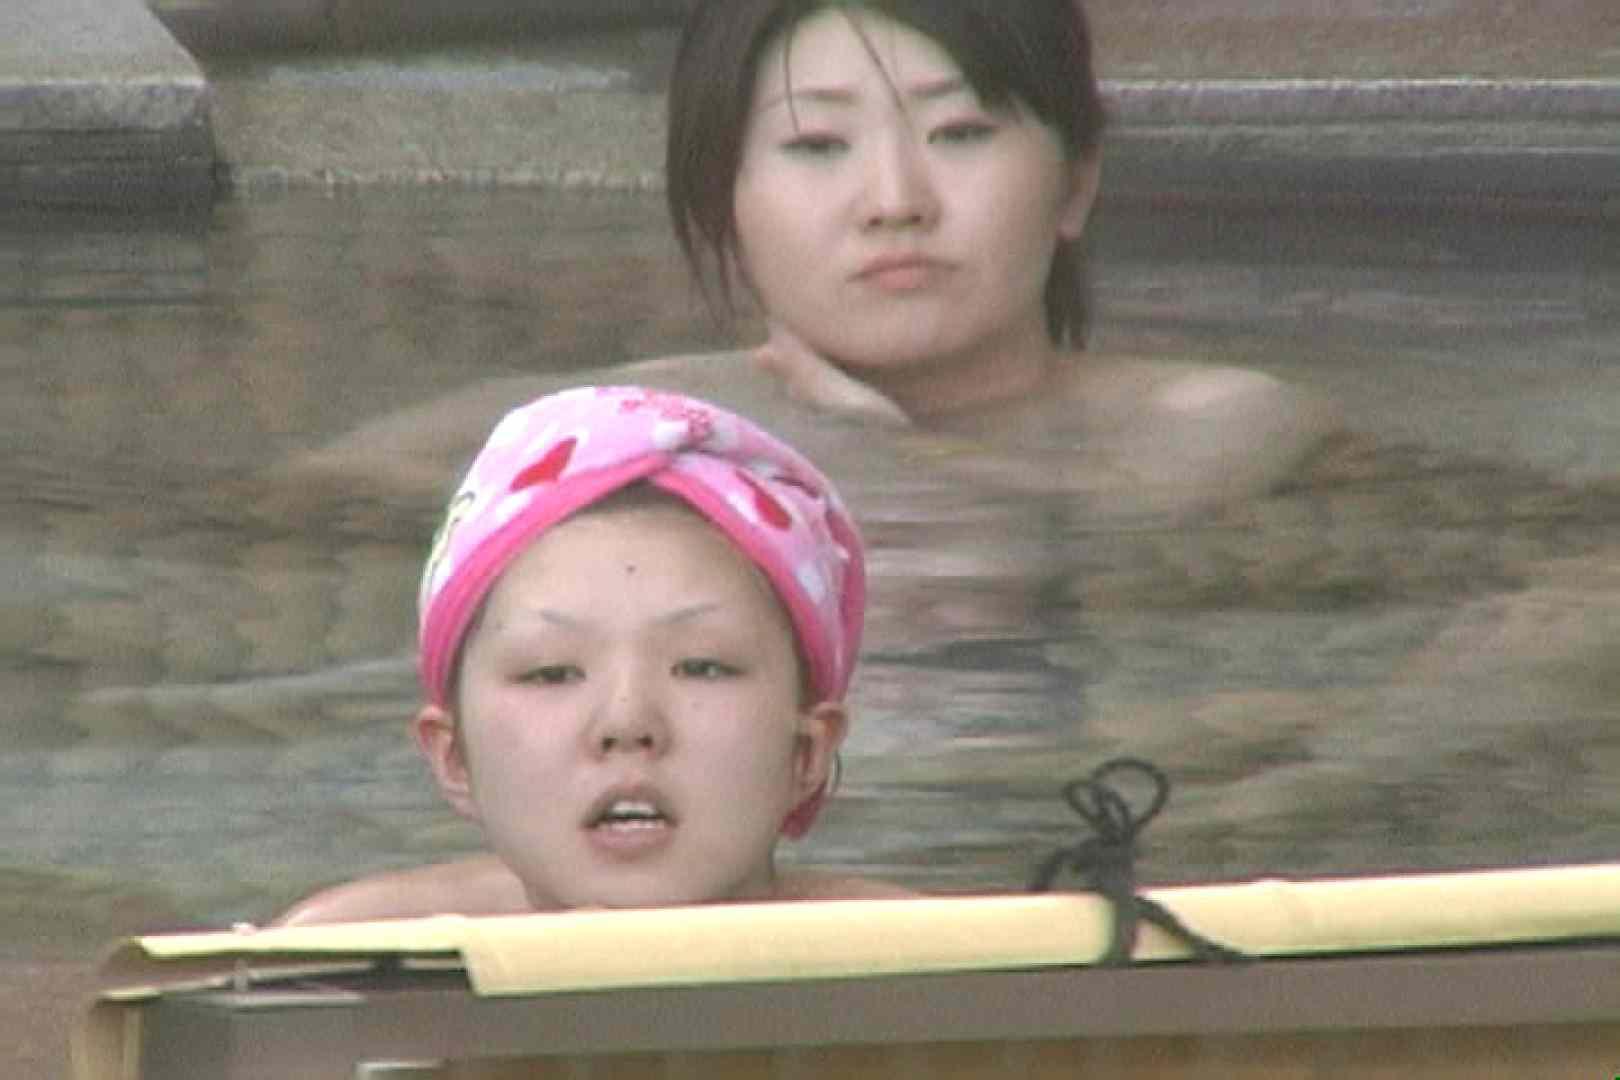 Aquaな露天風呂Vol.25 露天風呂編 | 盗撮シリーズ  91PIX 59